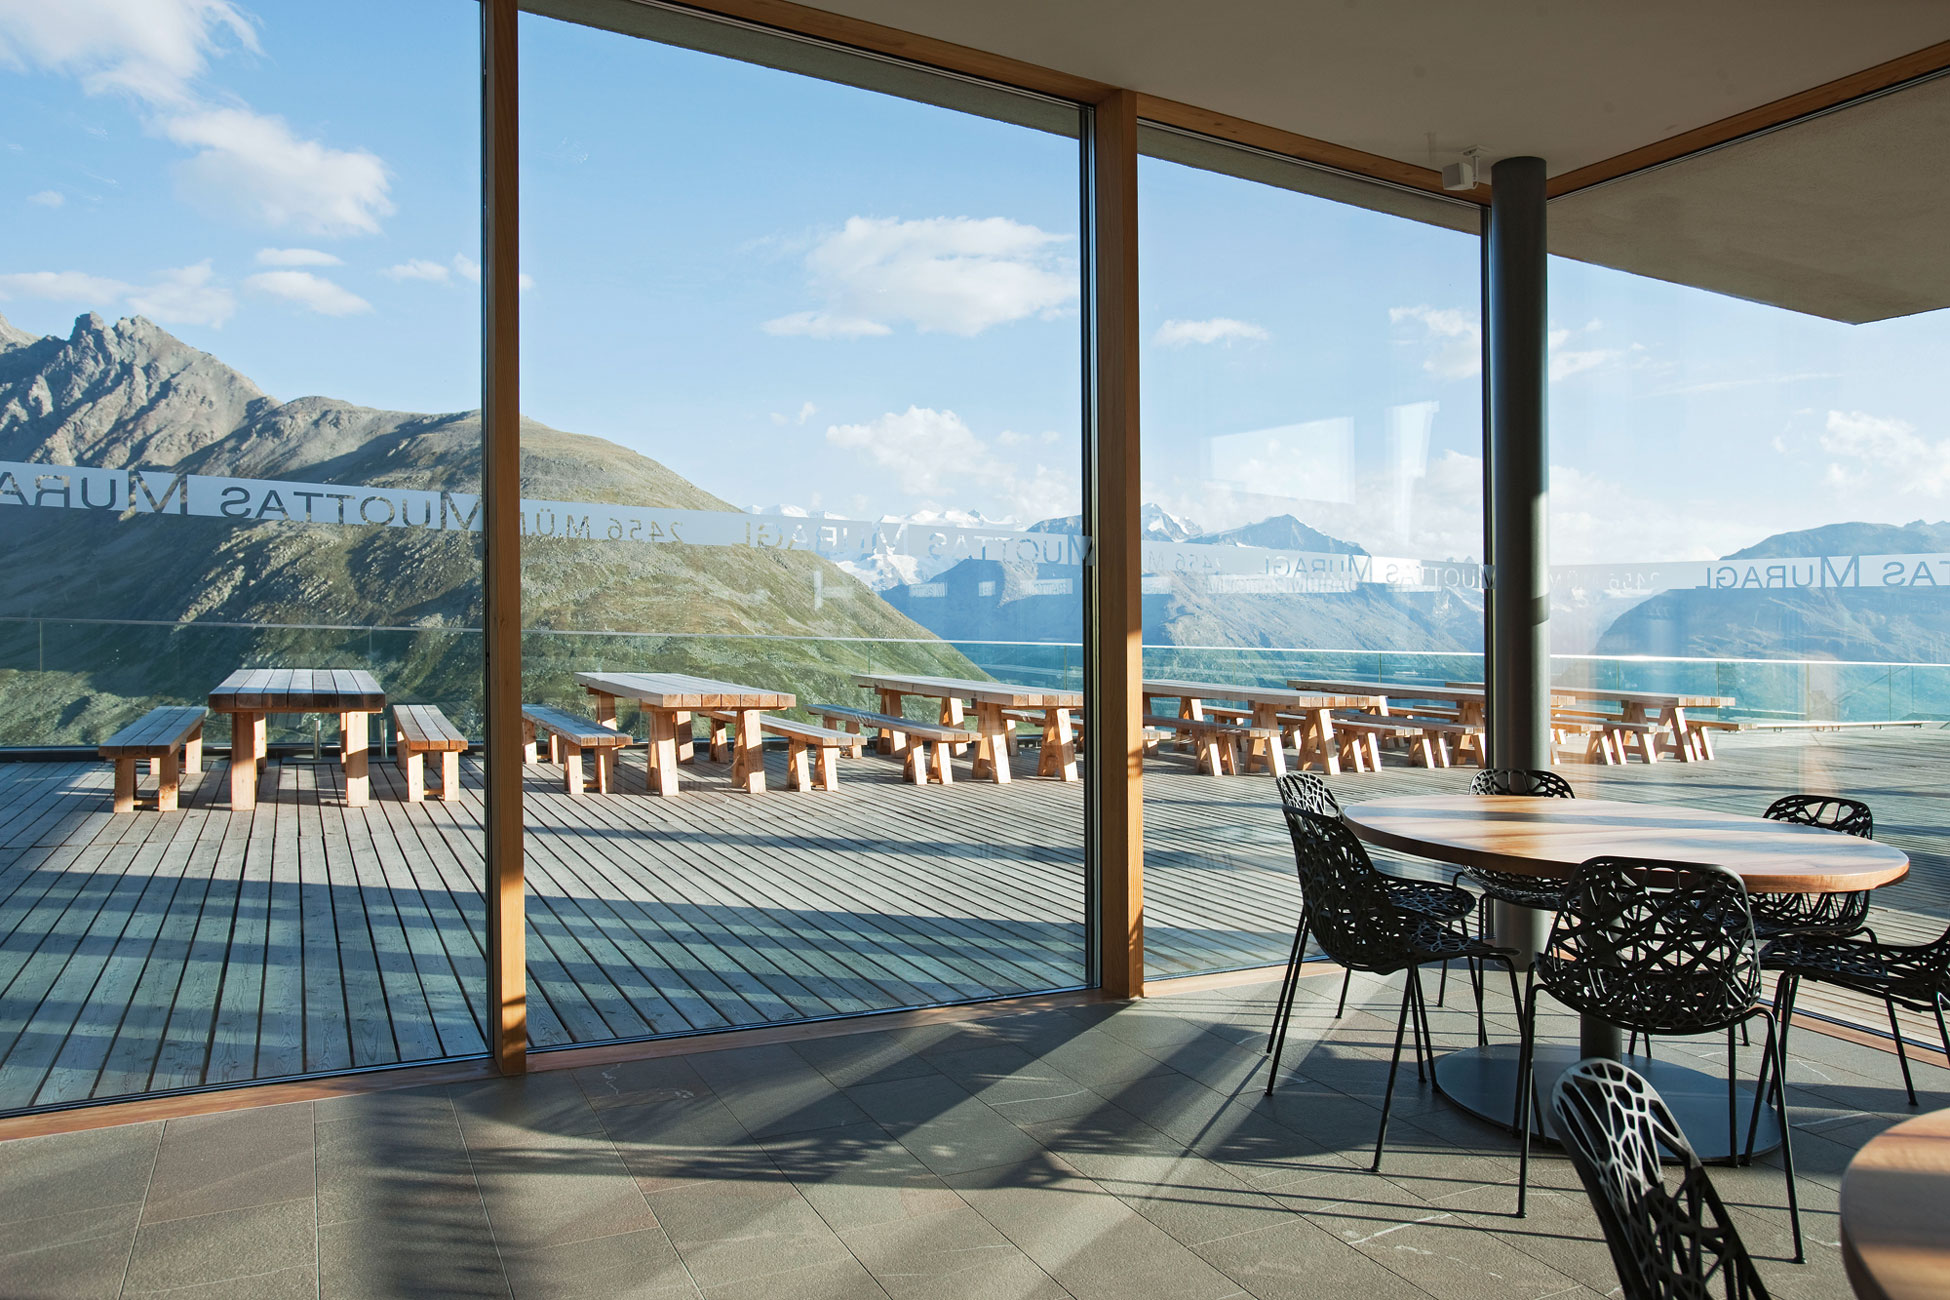 Romantik hotel muottas muragl by franzun ag homedezen for Romantik hotel